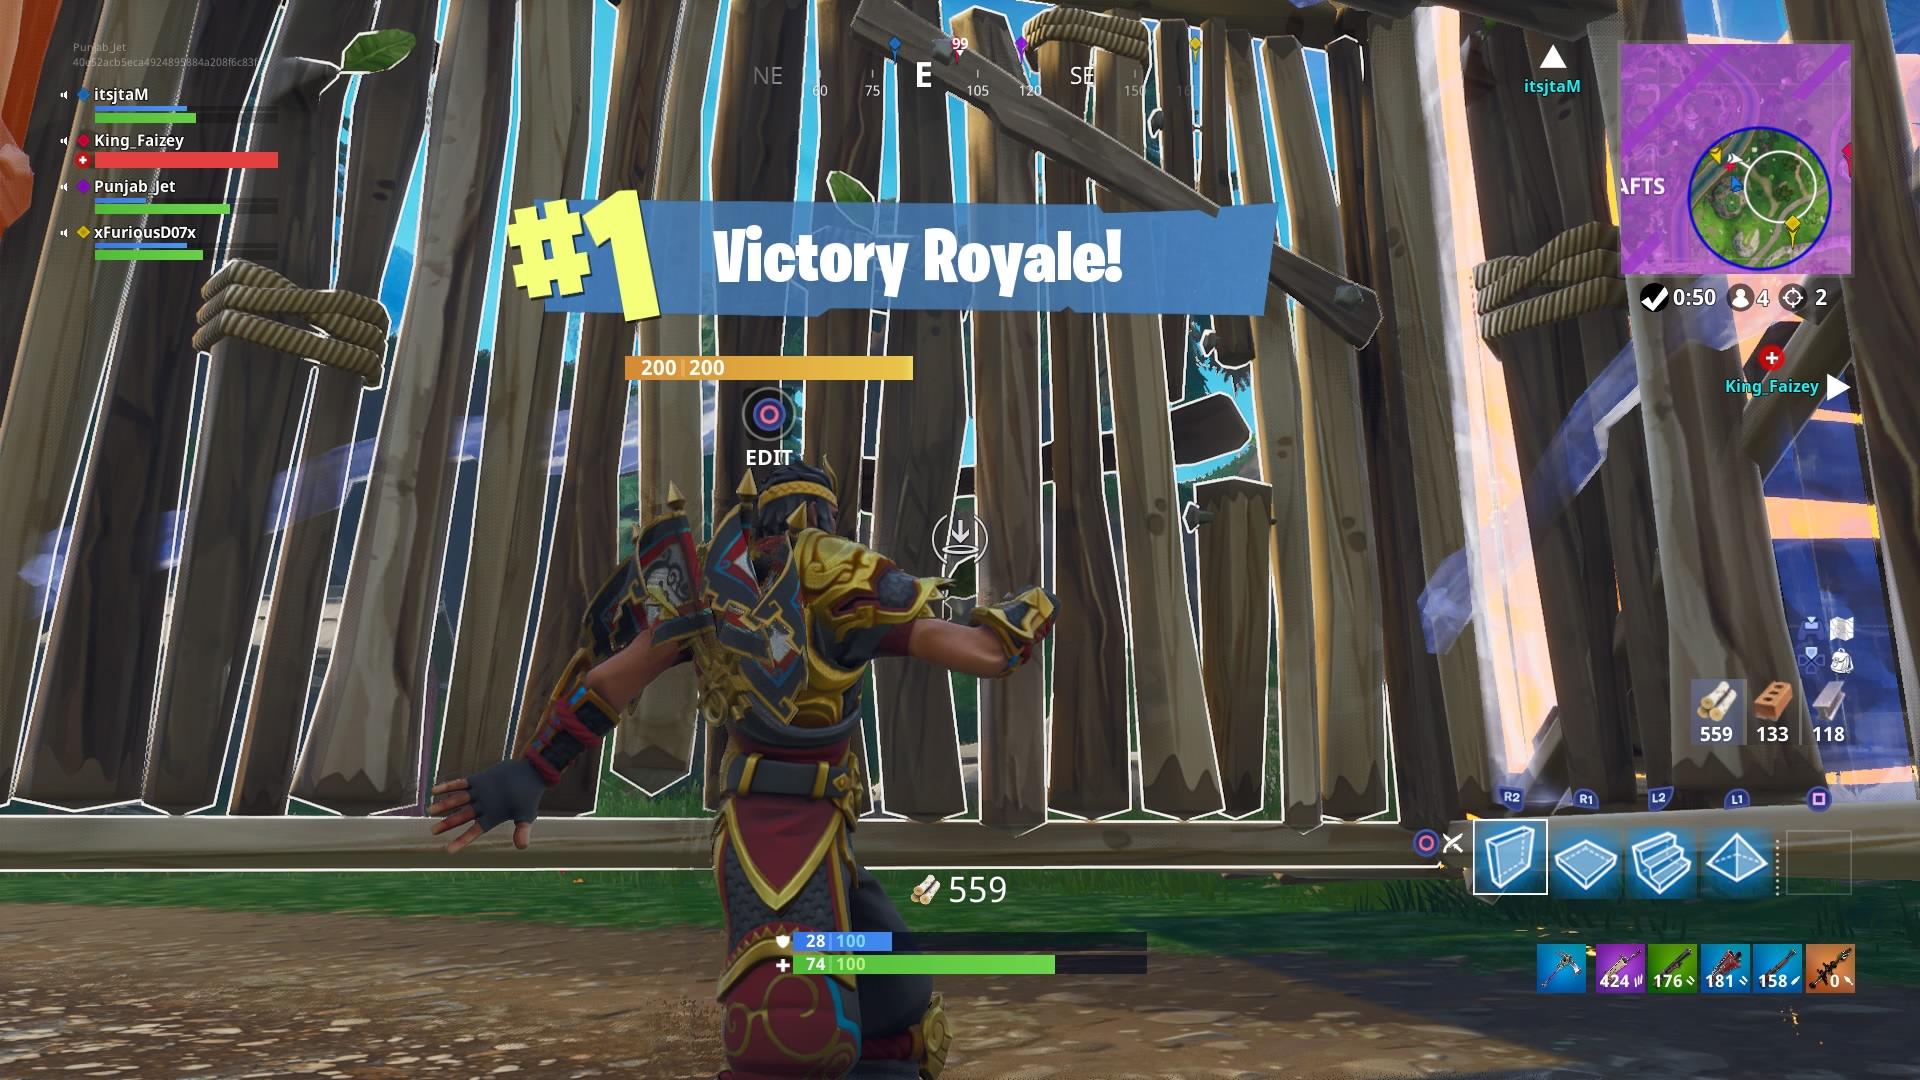 fortnite victory royale dance wallpaper background 64481